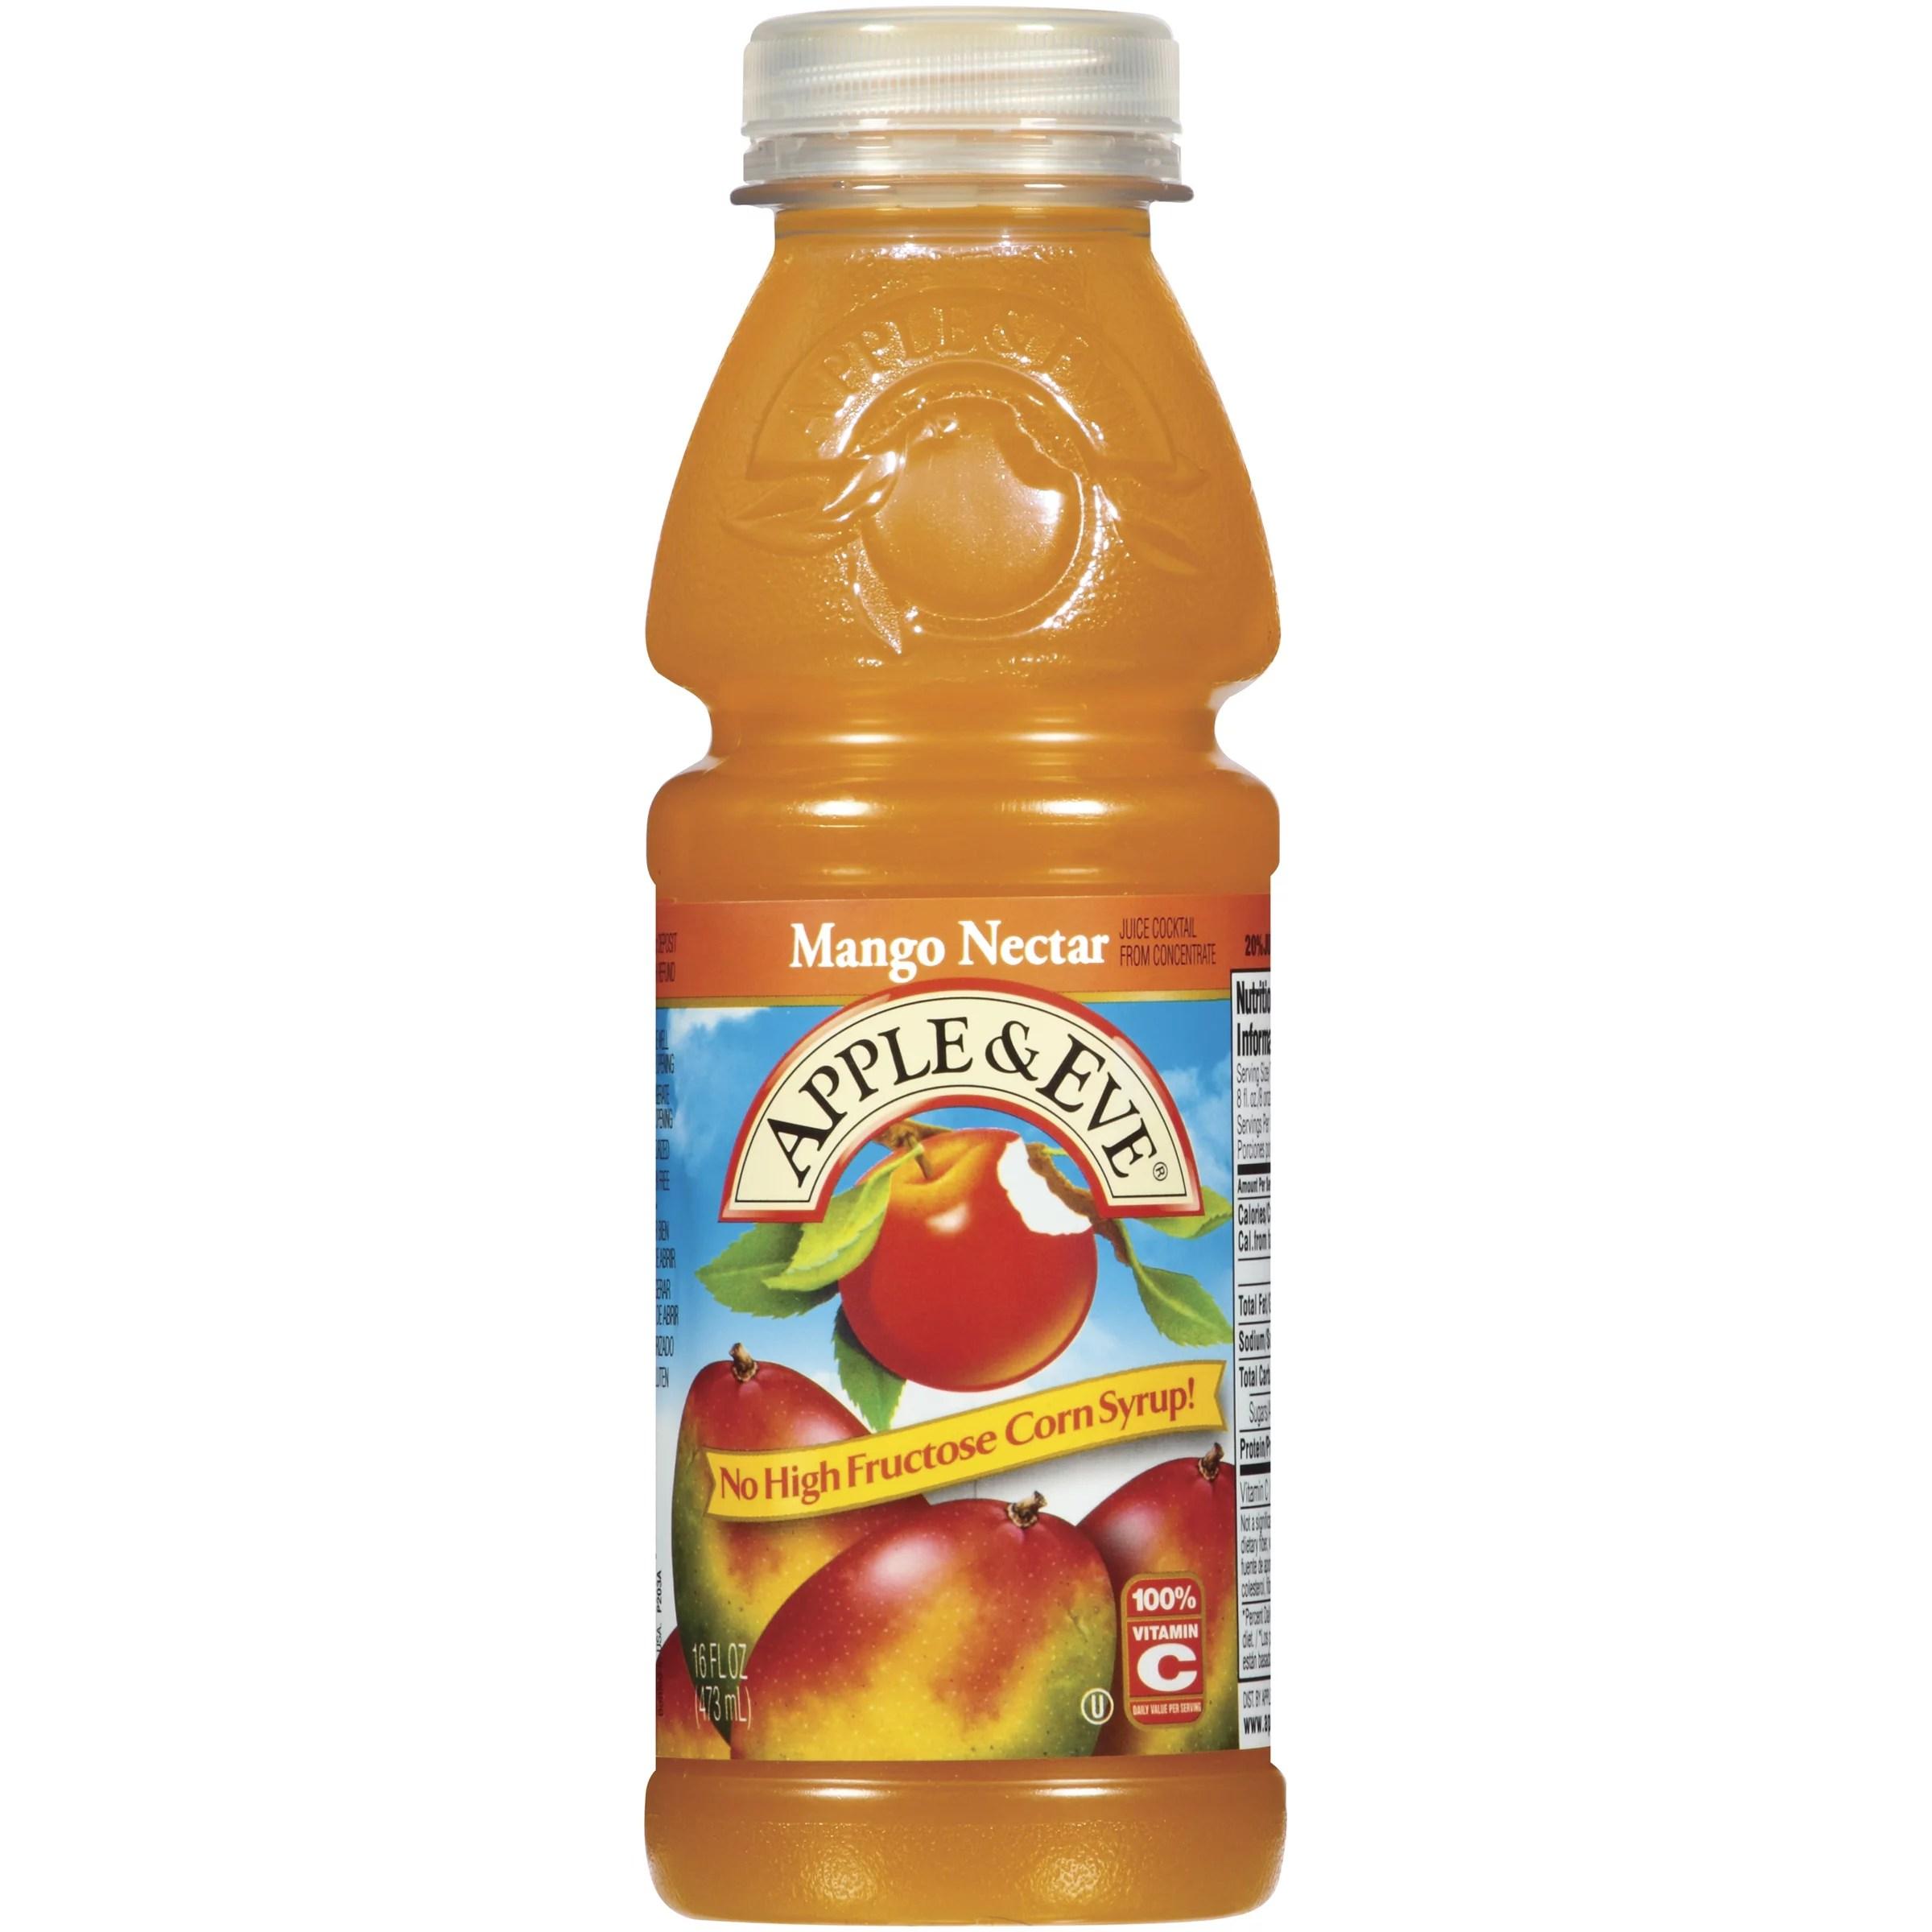 Apple Eve Mango Nectar Juice 16 Fl Oz Walmartcom